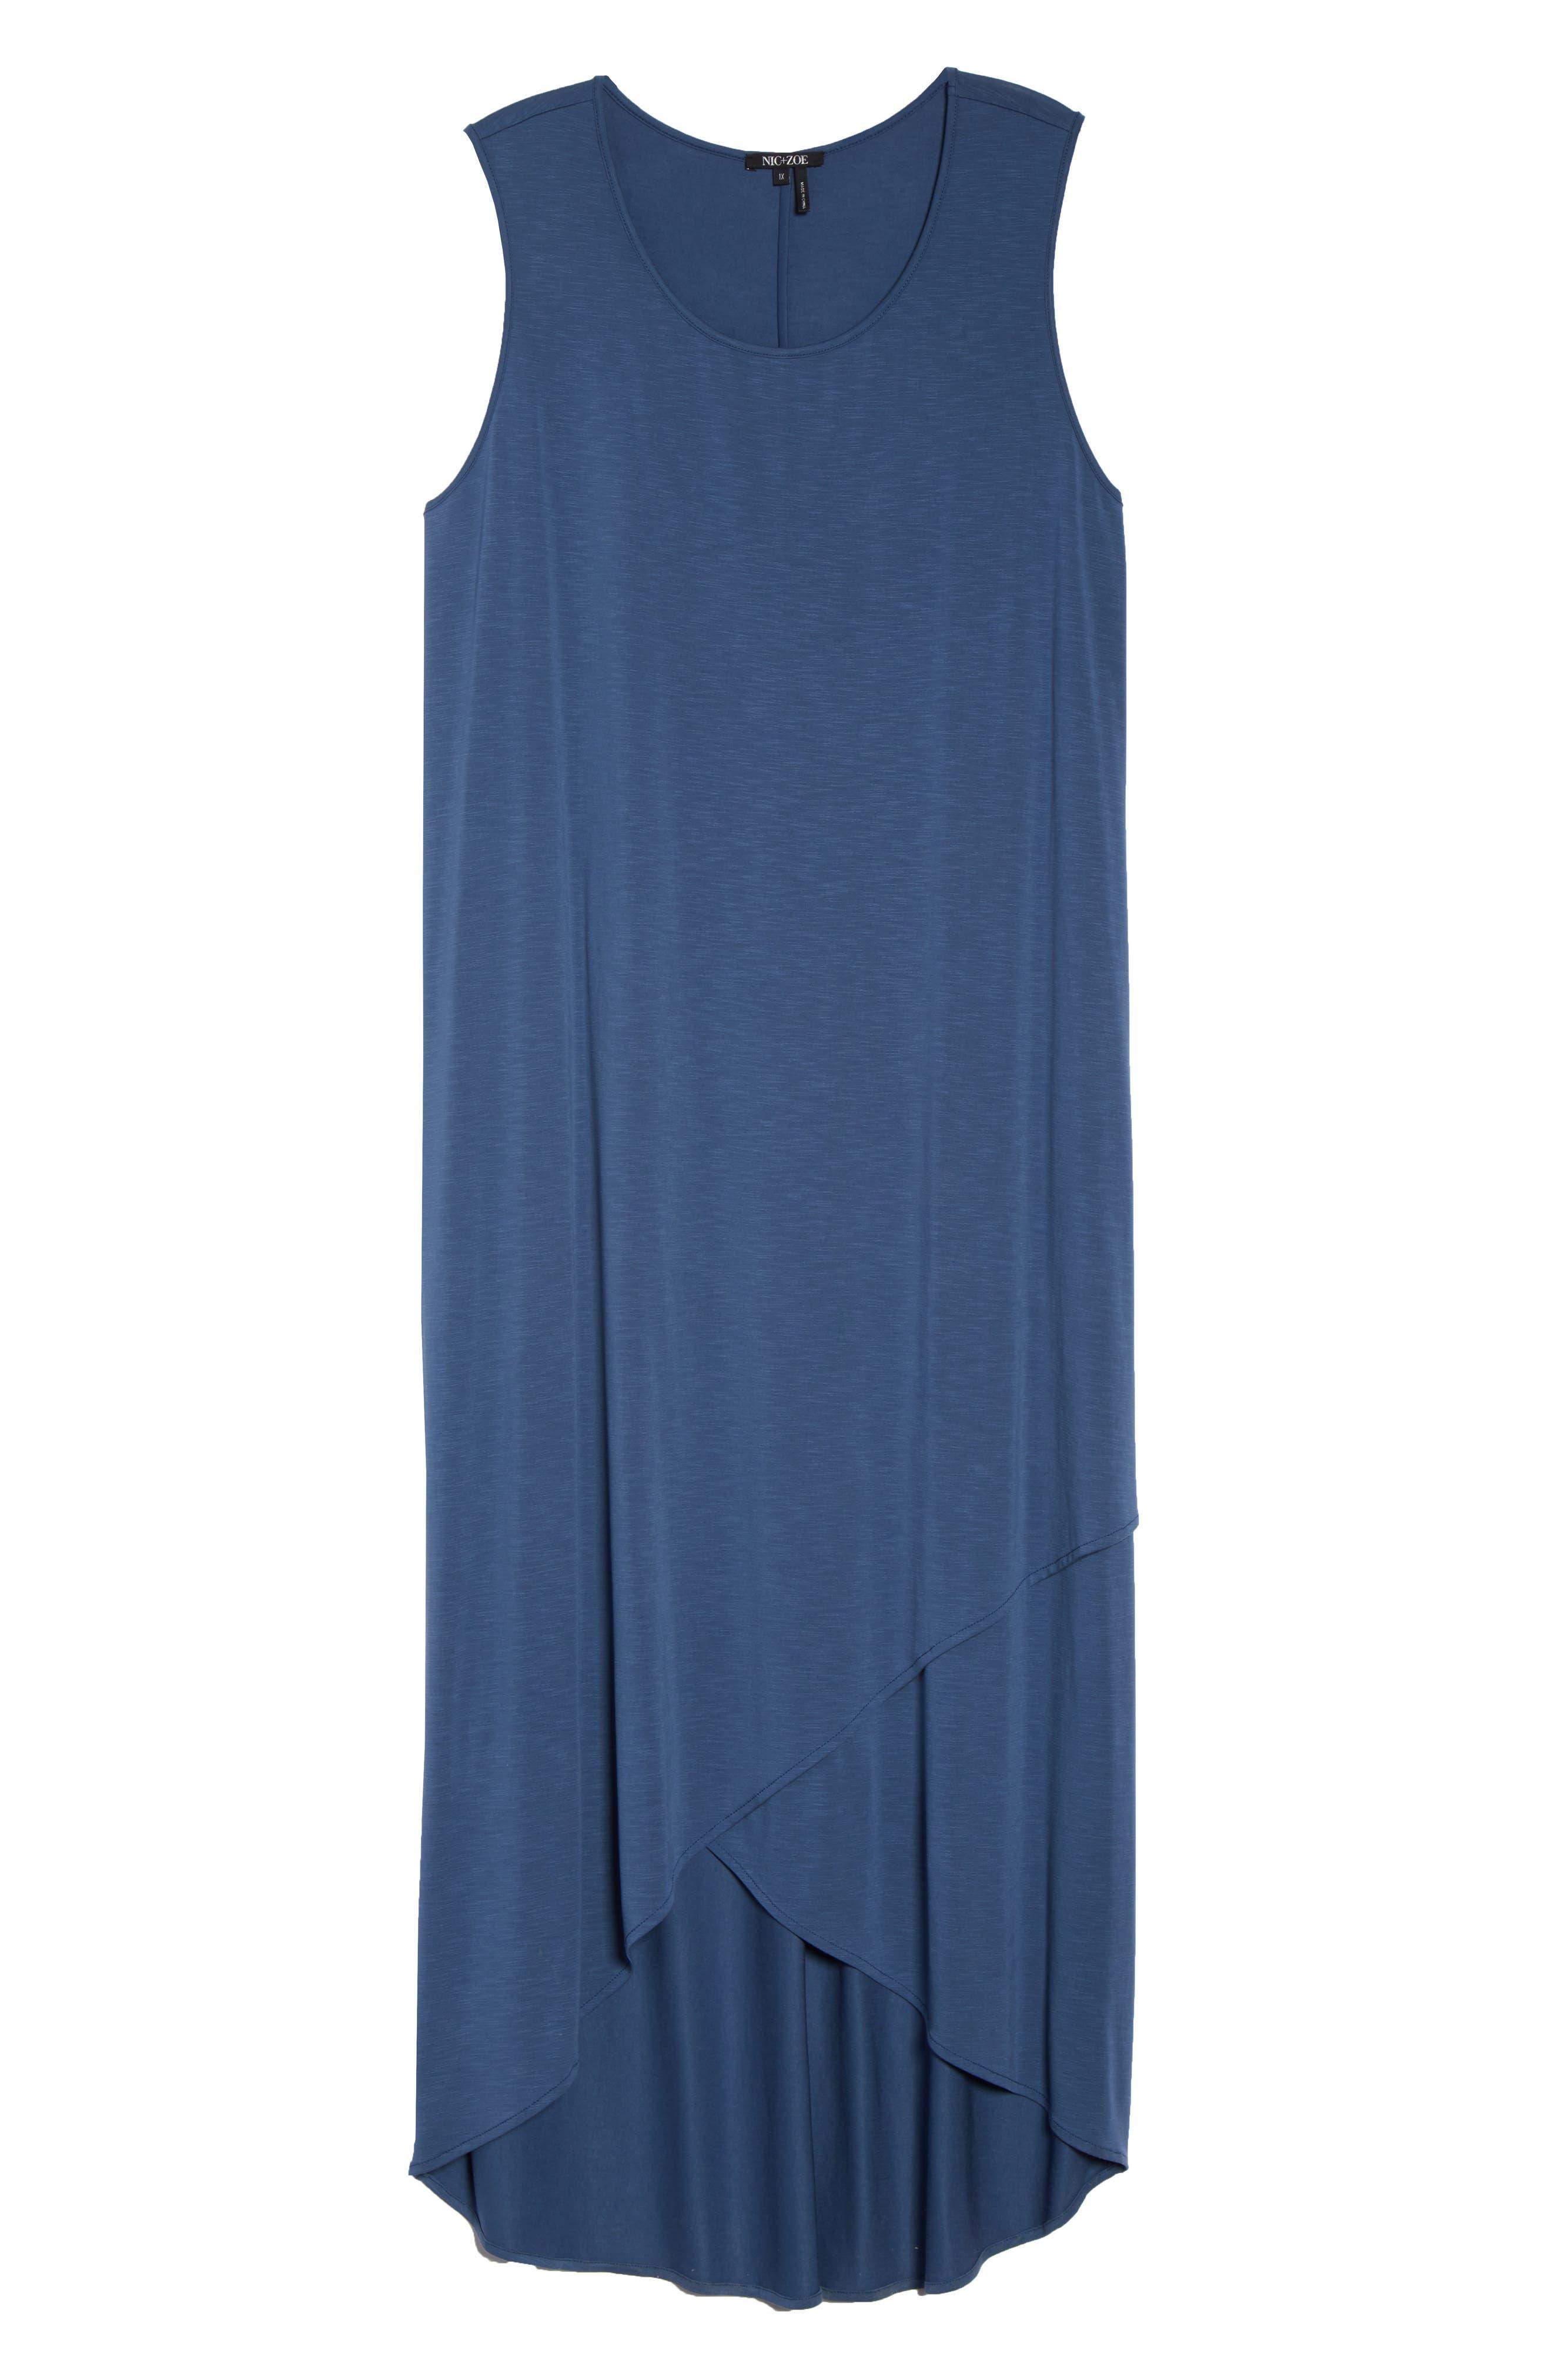 Boardwalk Jersey High/Low Dress,                             Alternate thumbnail 7, color,                             Washed Rich Indigo